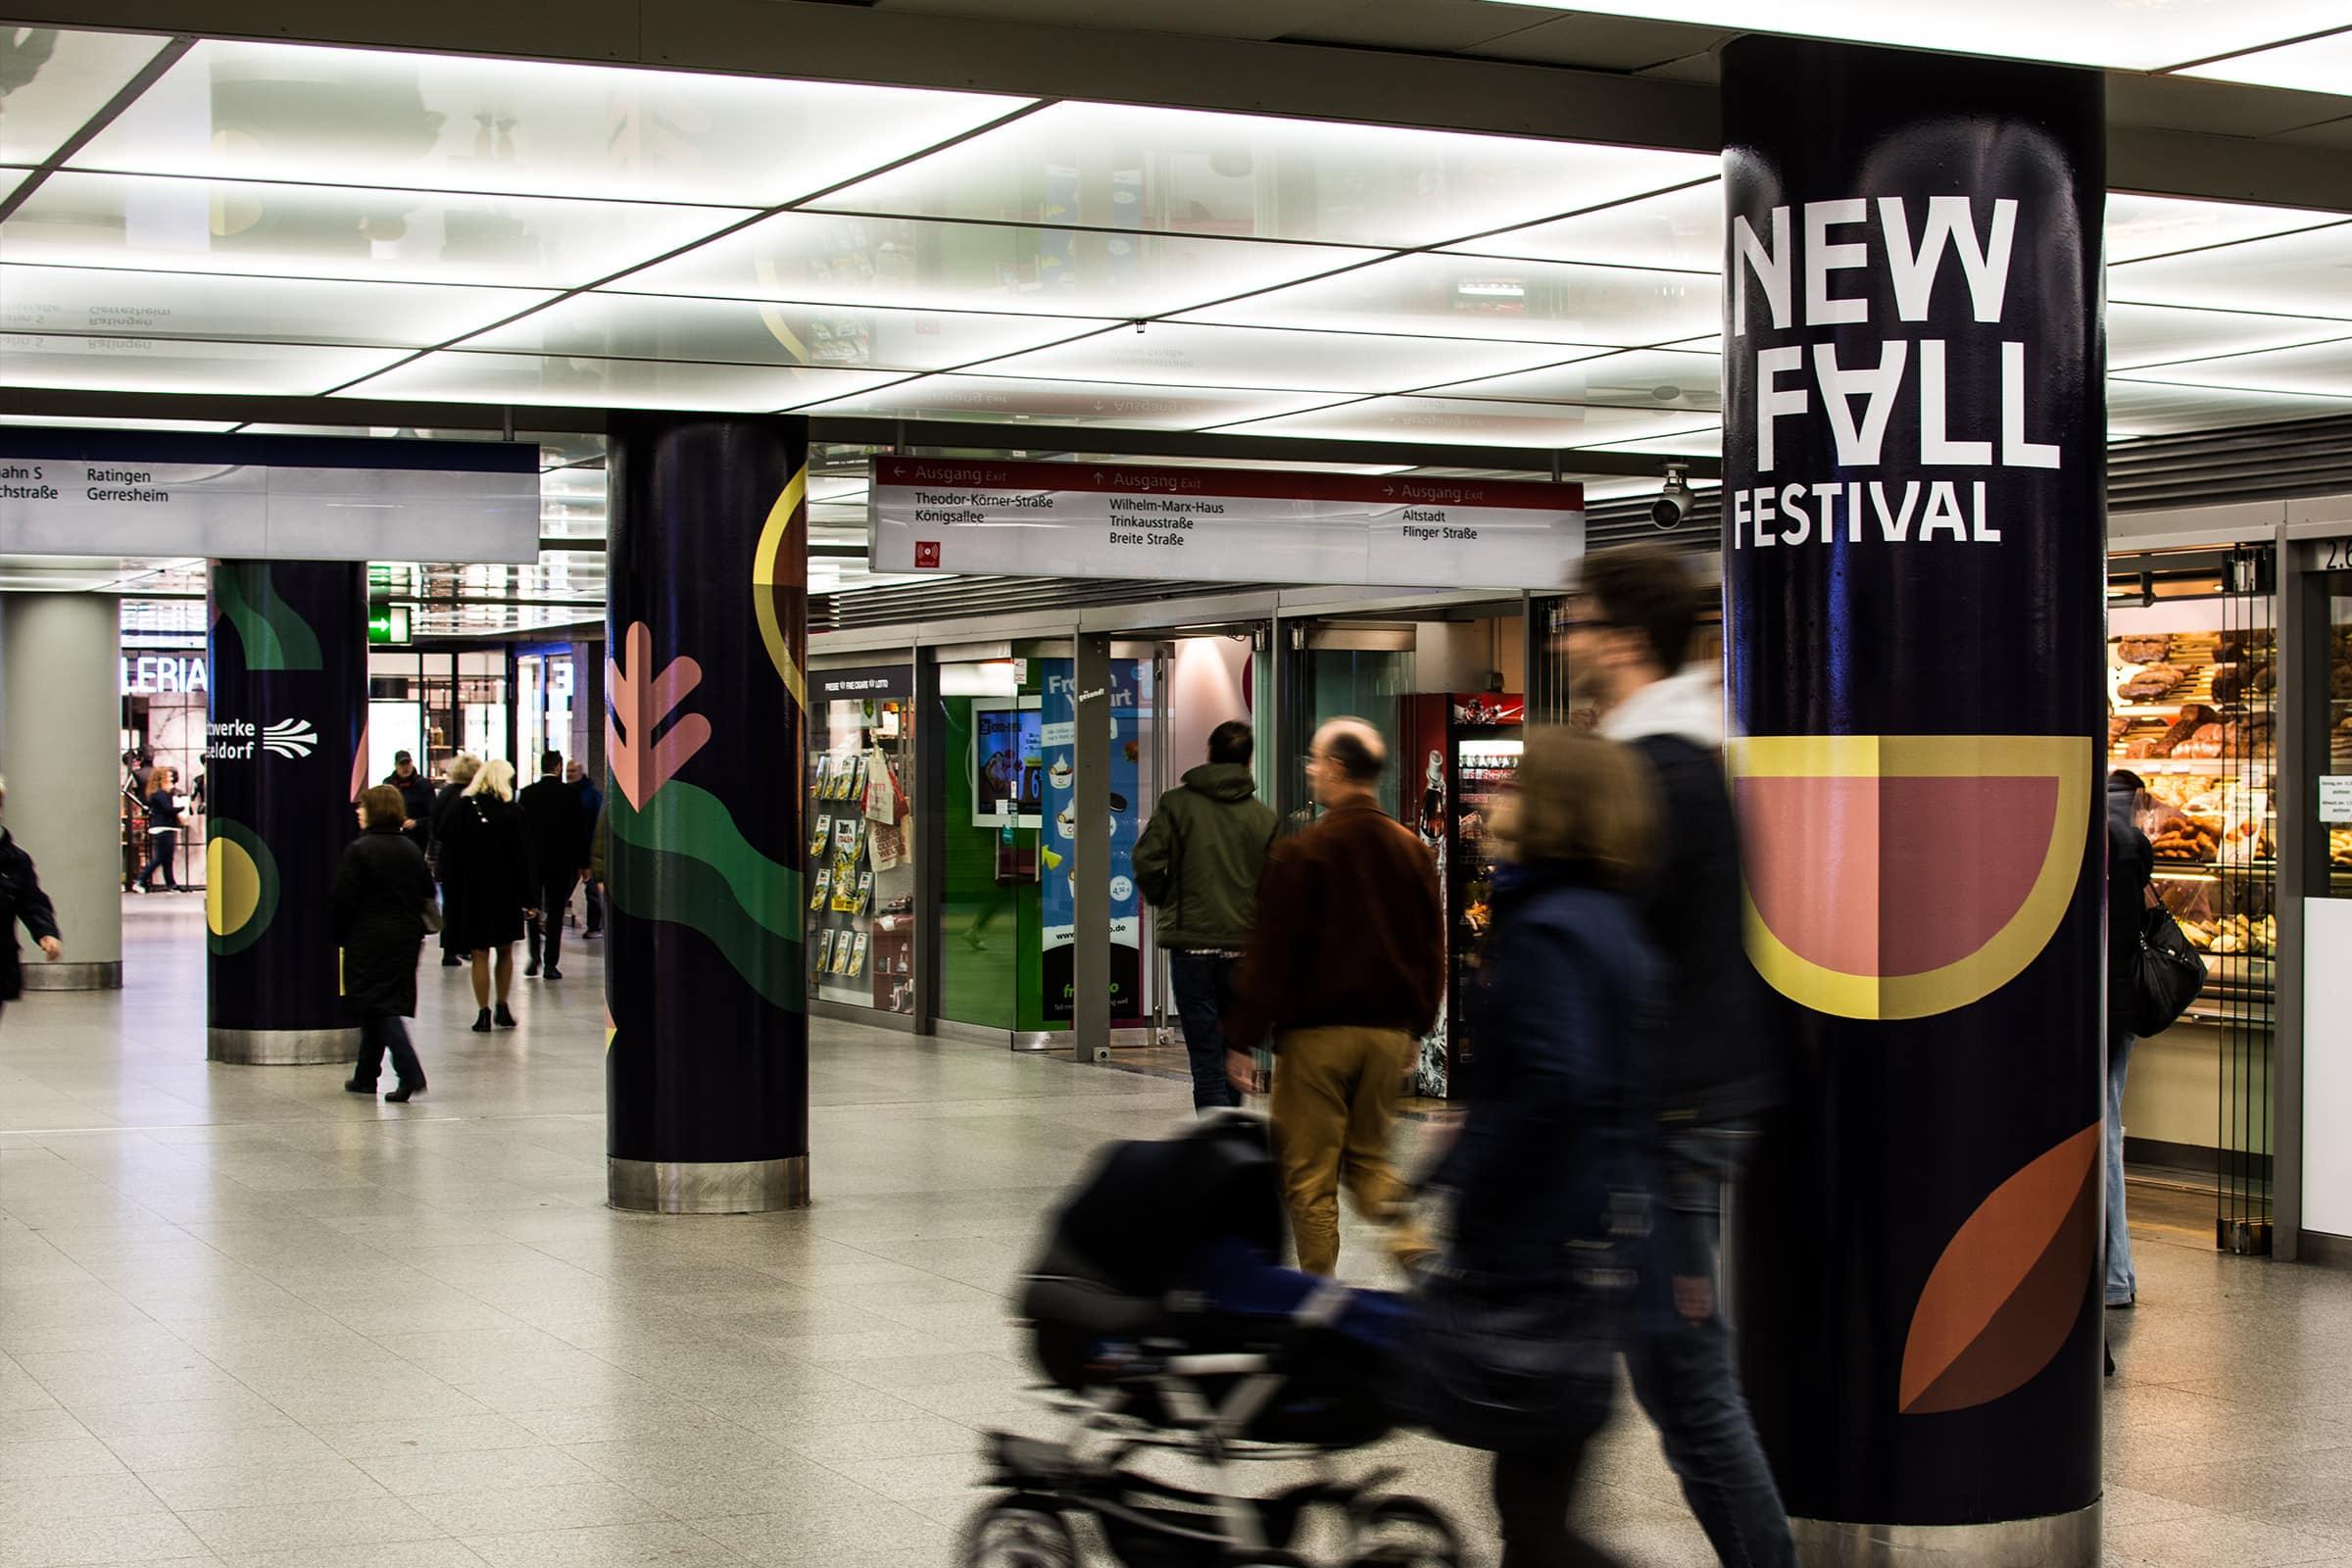 Düsseldorf, Heinrich-Heine-Allee, U-Bahnhof, Beklebung, New Fall Festival, Corporate Design